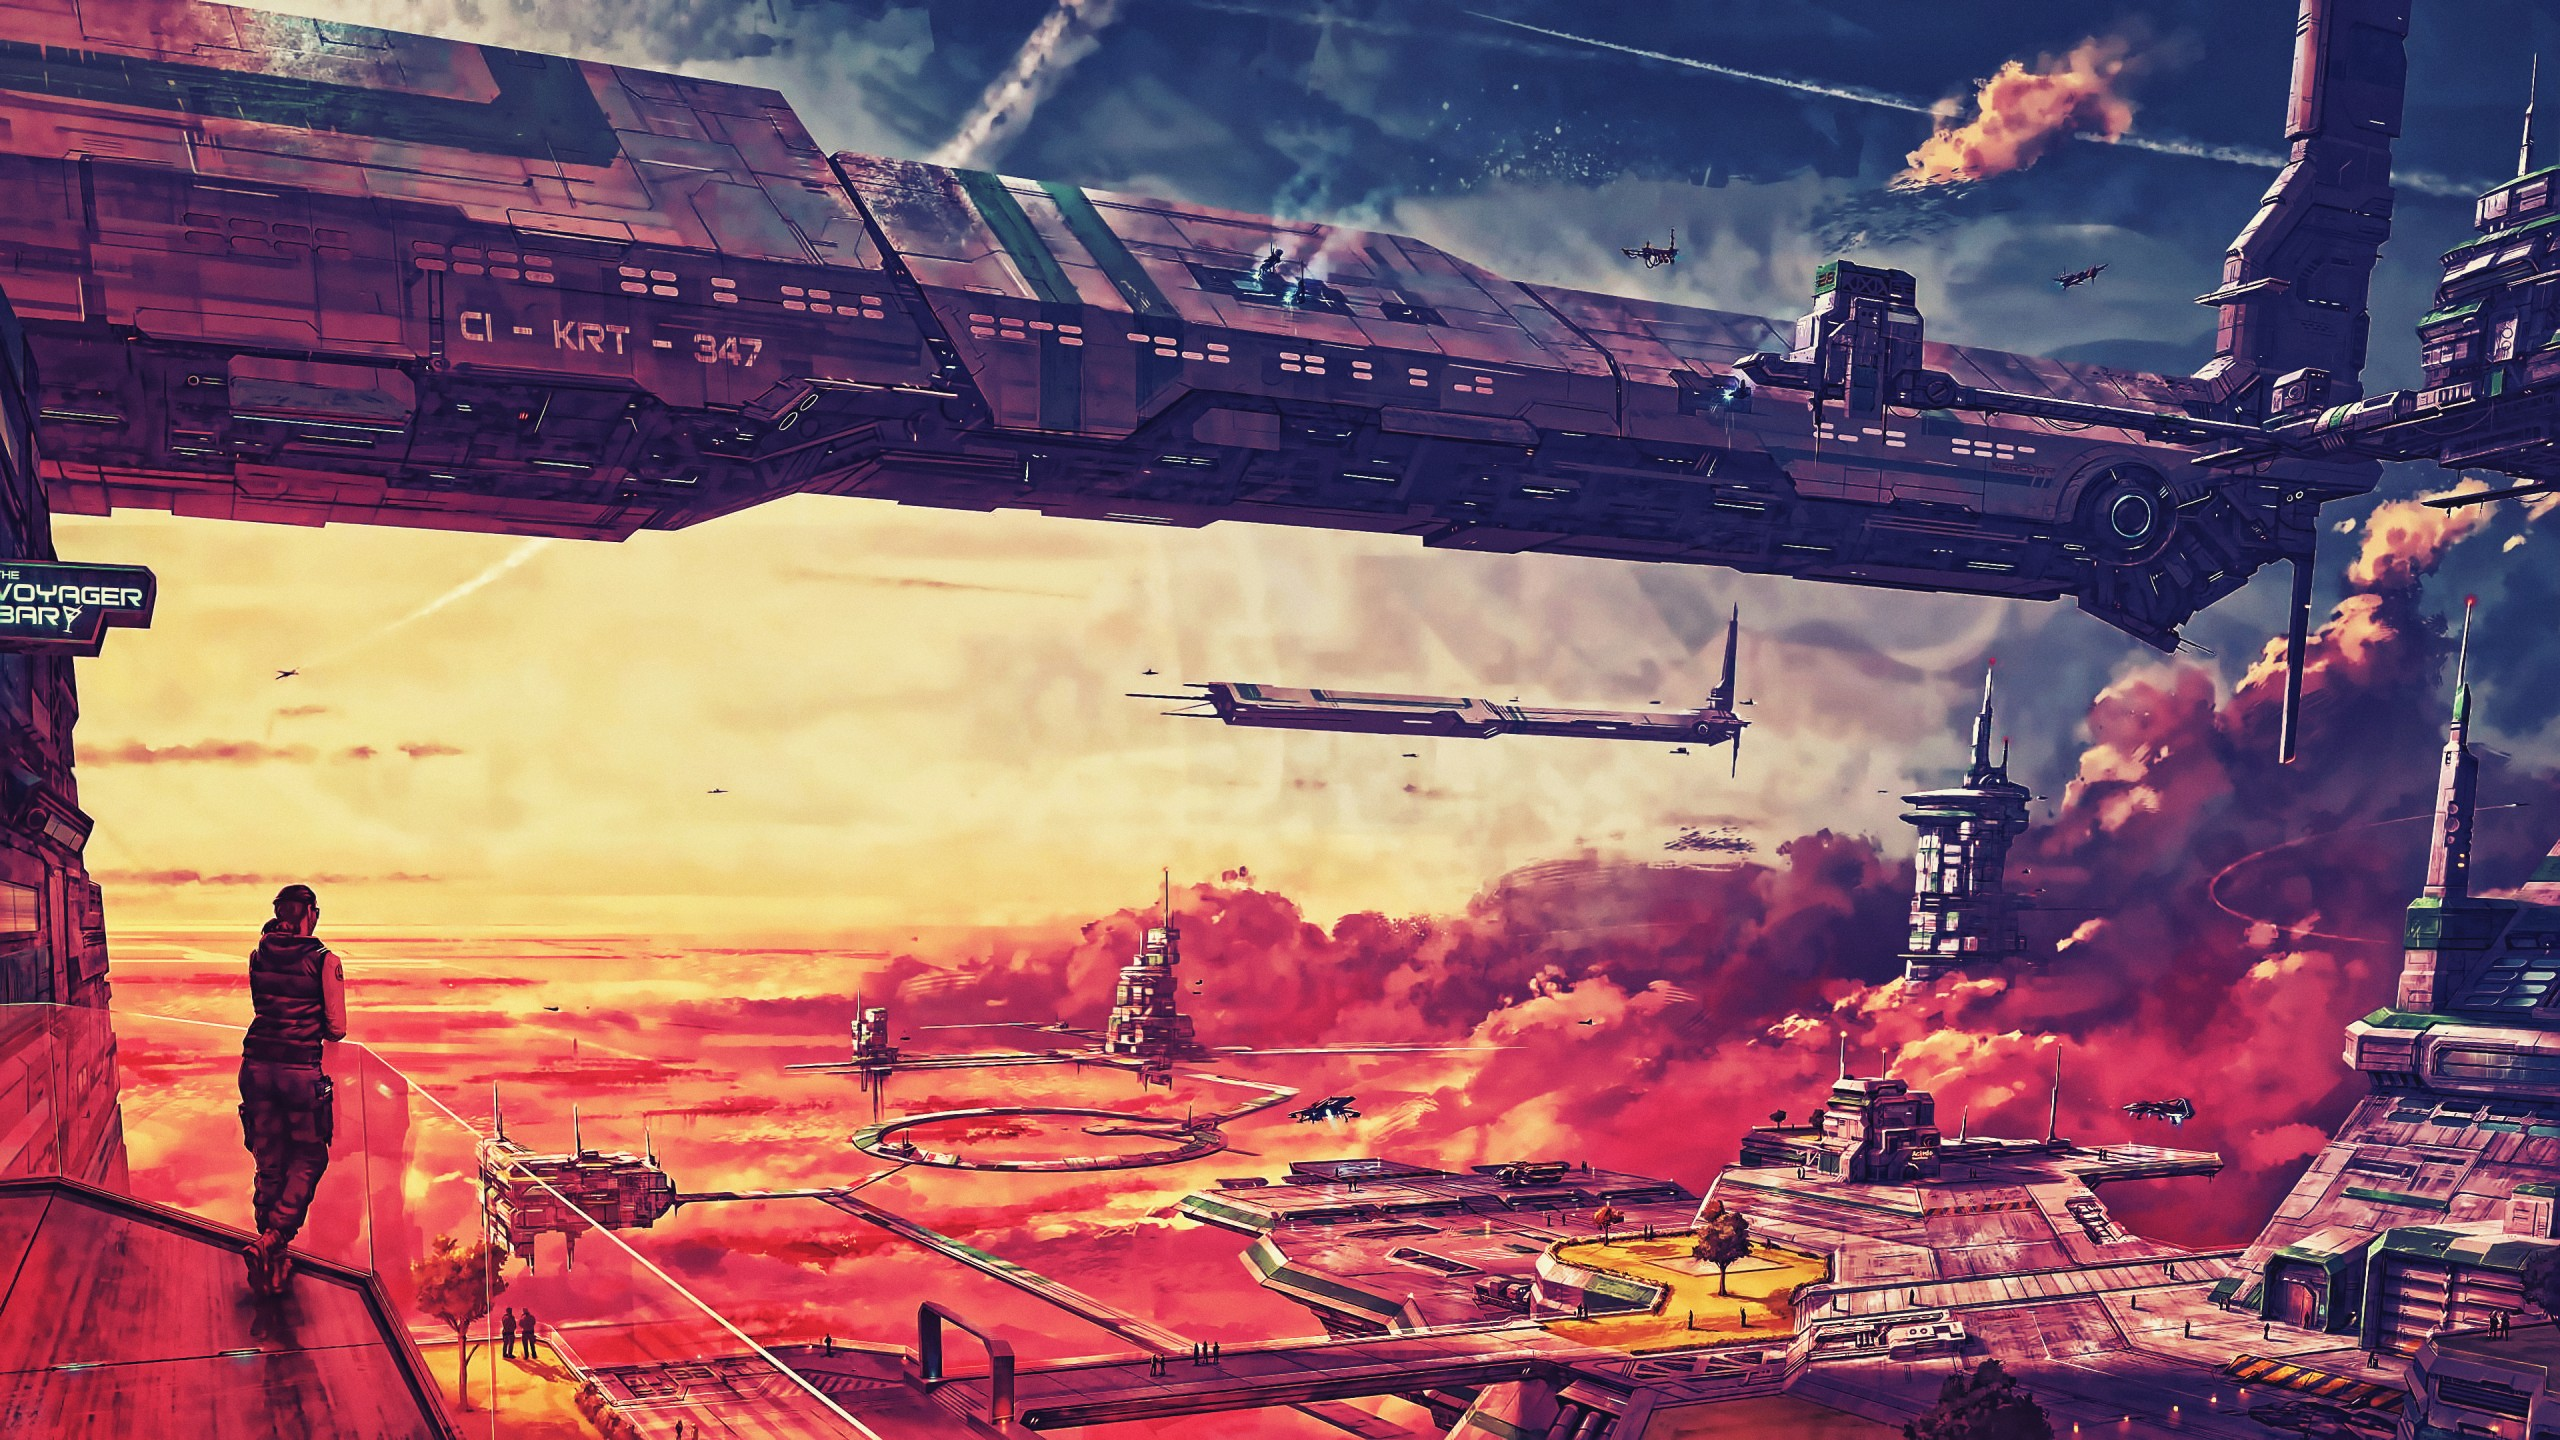 Wallpaper Futuristic Spaceship Future World 4k Art 20317